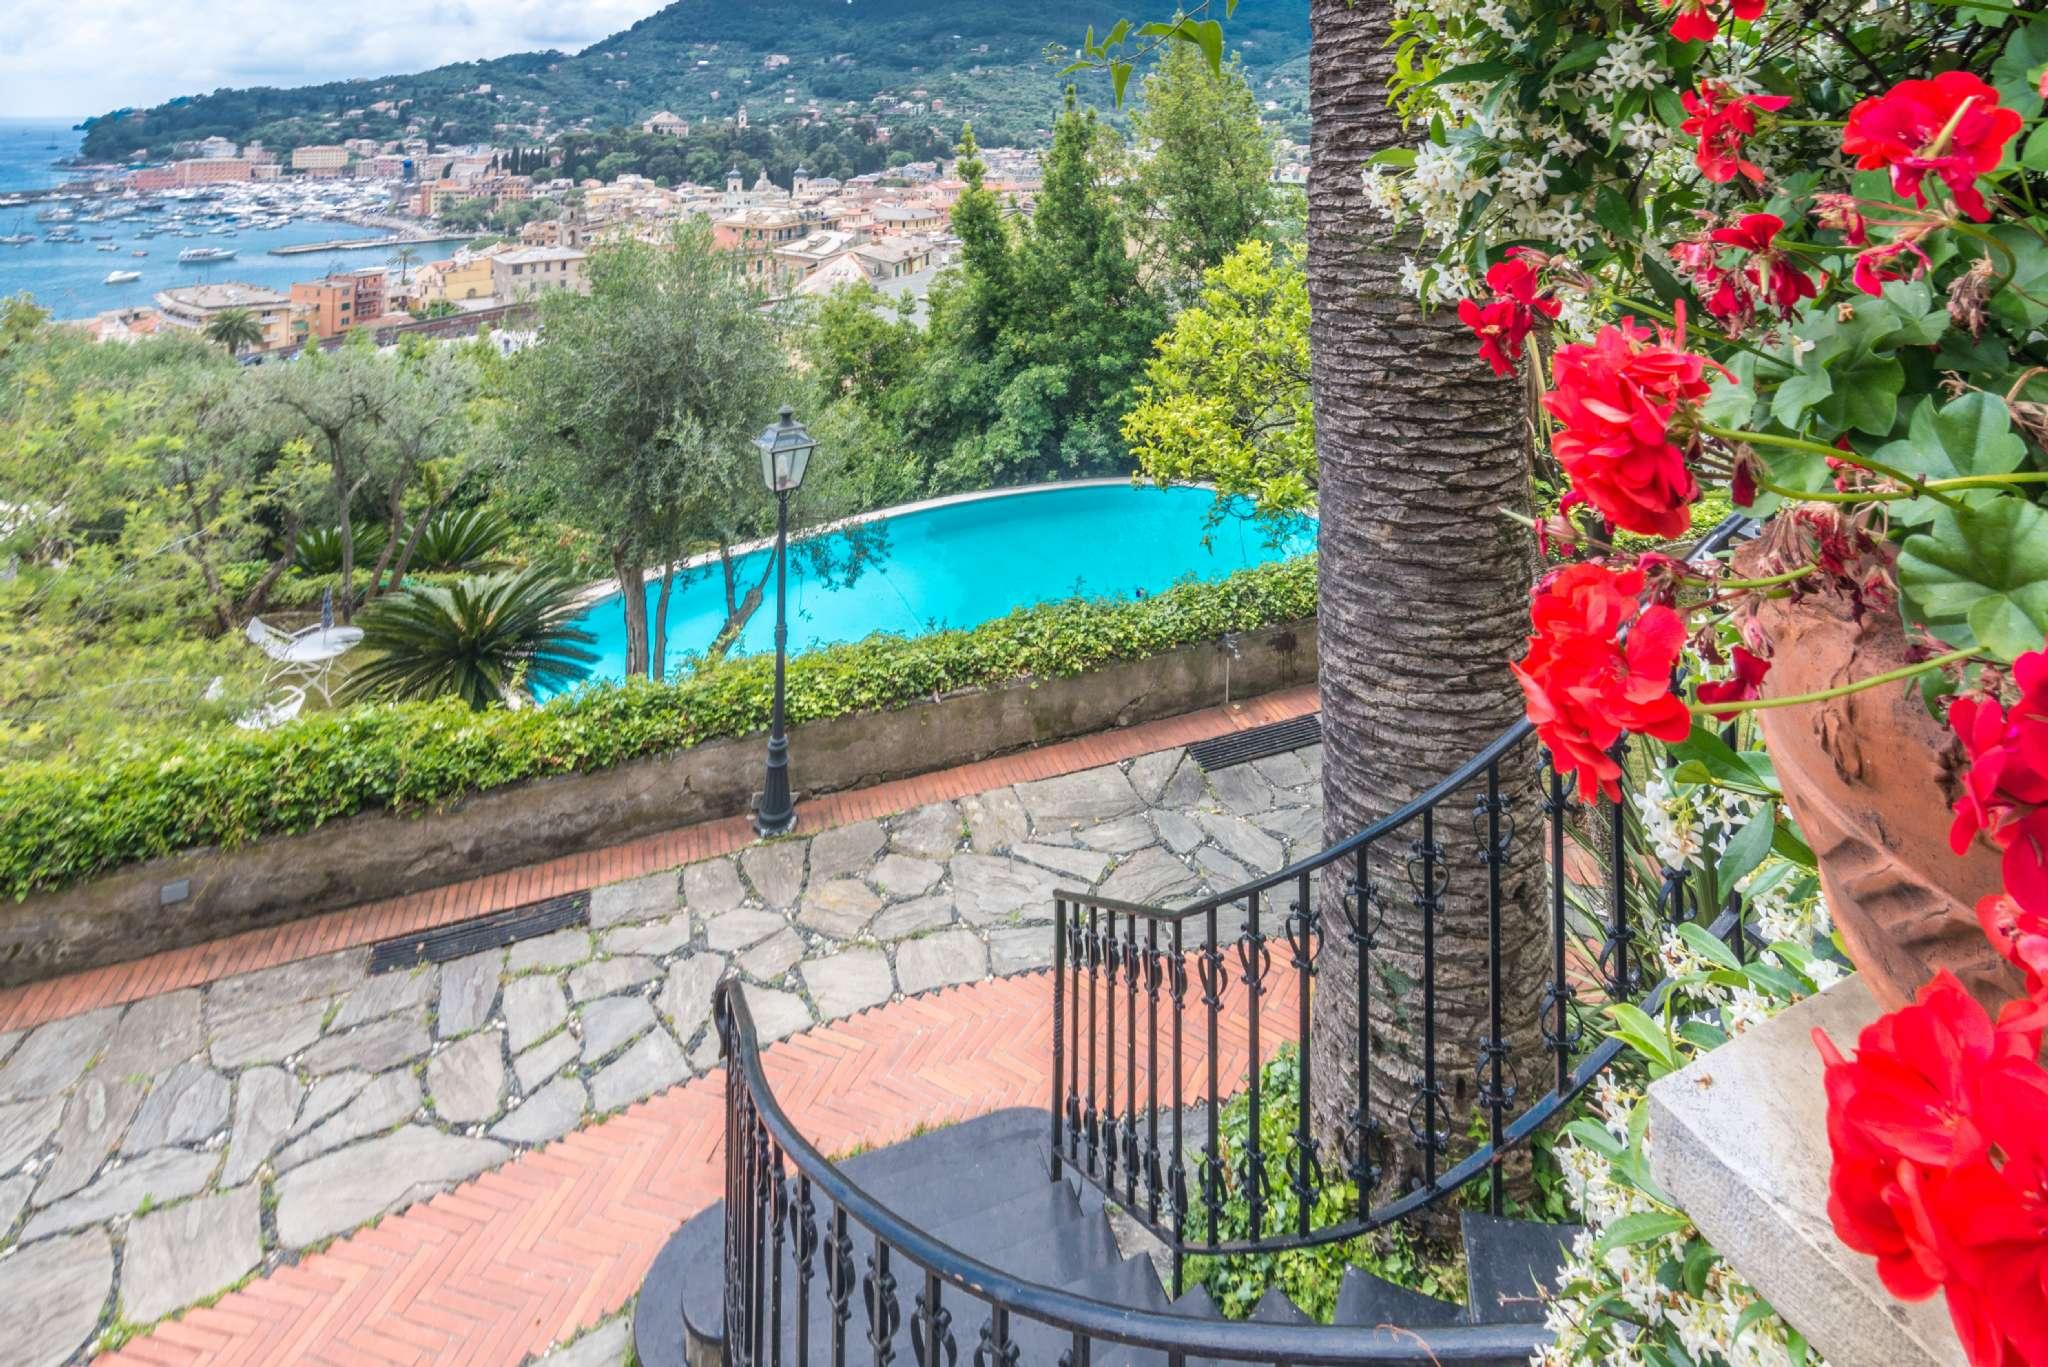 Villa in Vendita a Santa Margherita Ligure: 0 locali, 530 mq - Foto 8